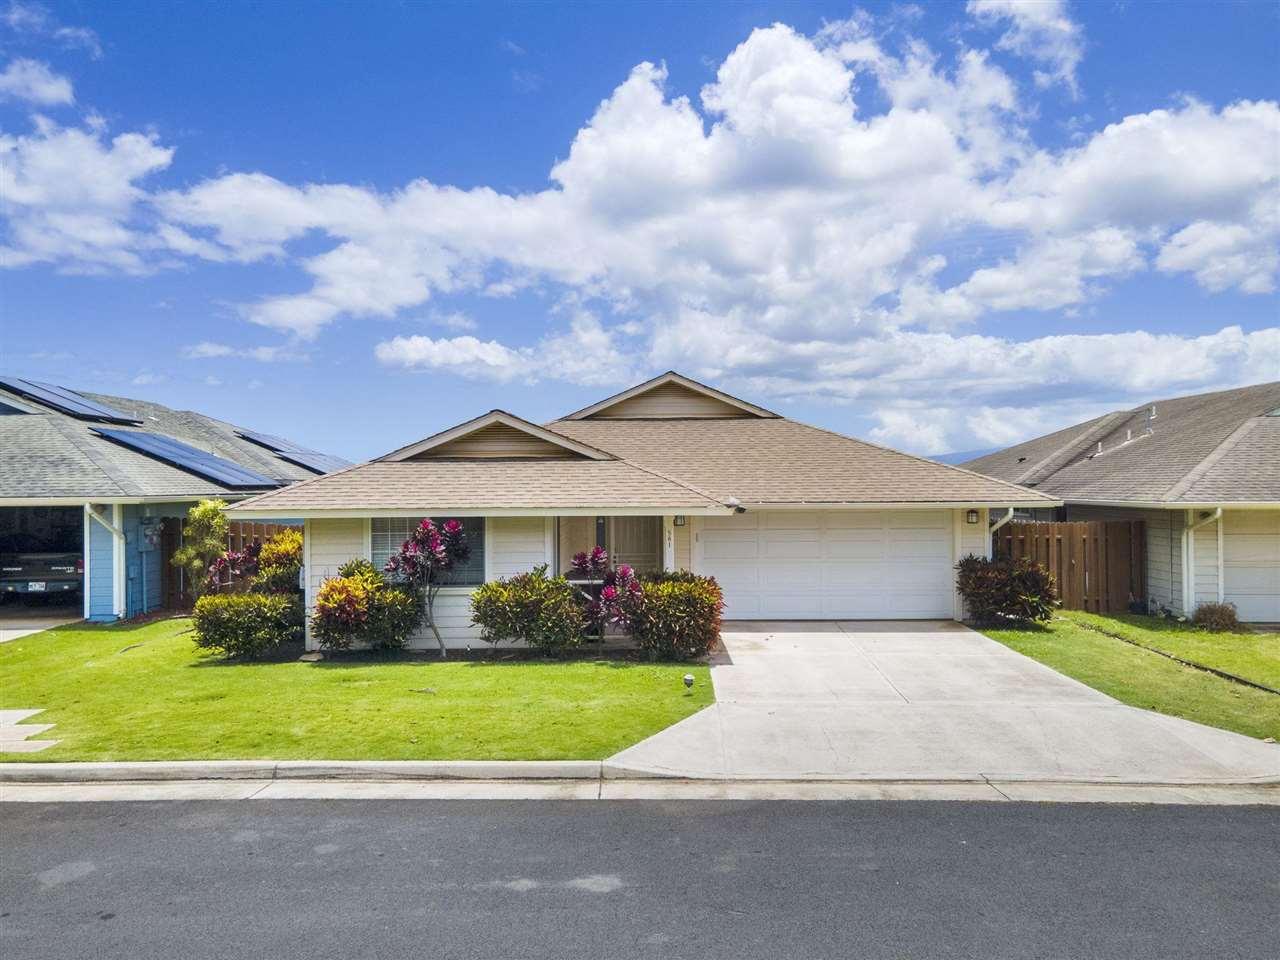 581 Akolea St Property Photo